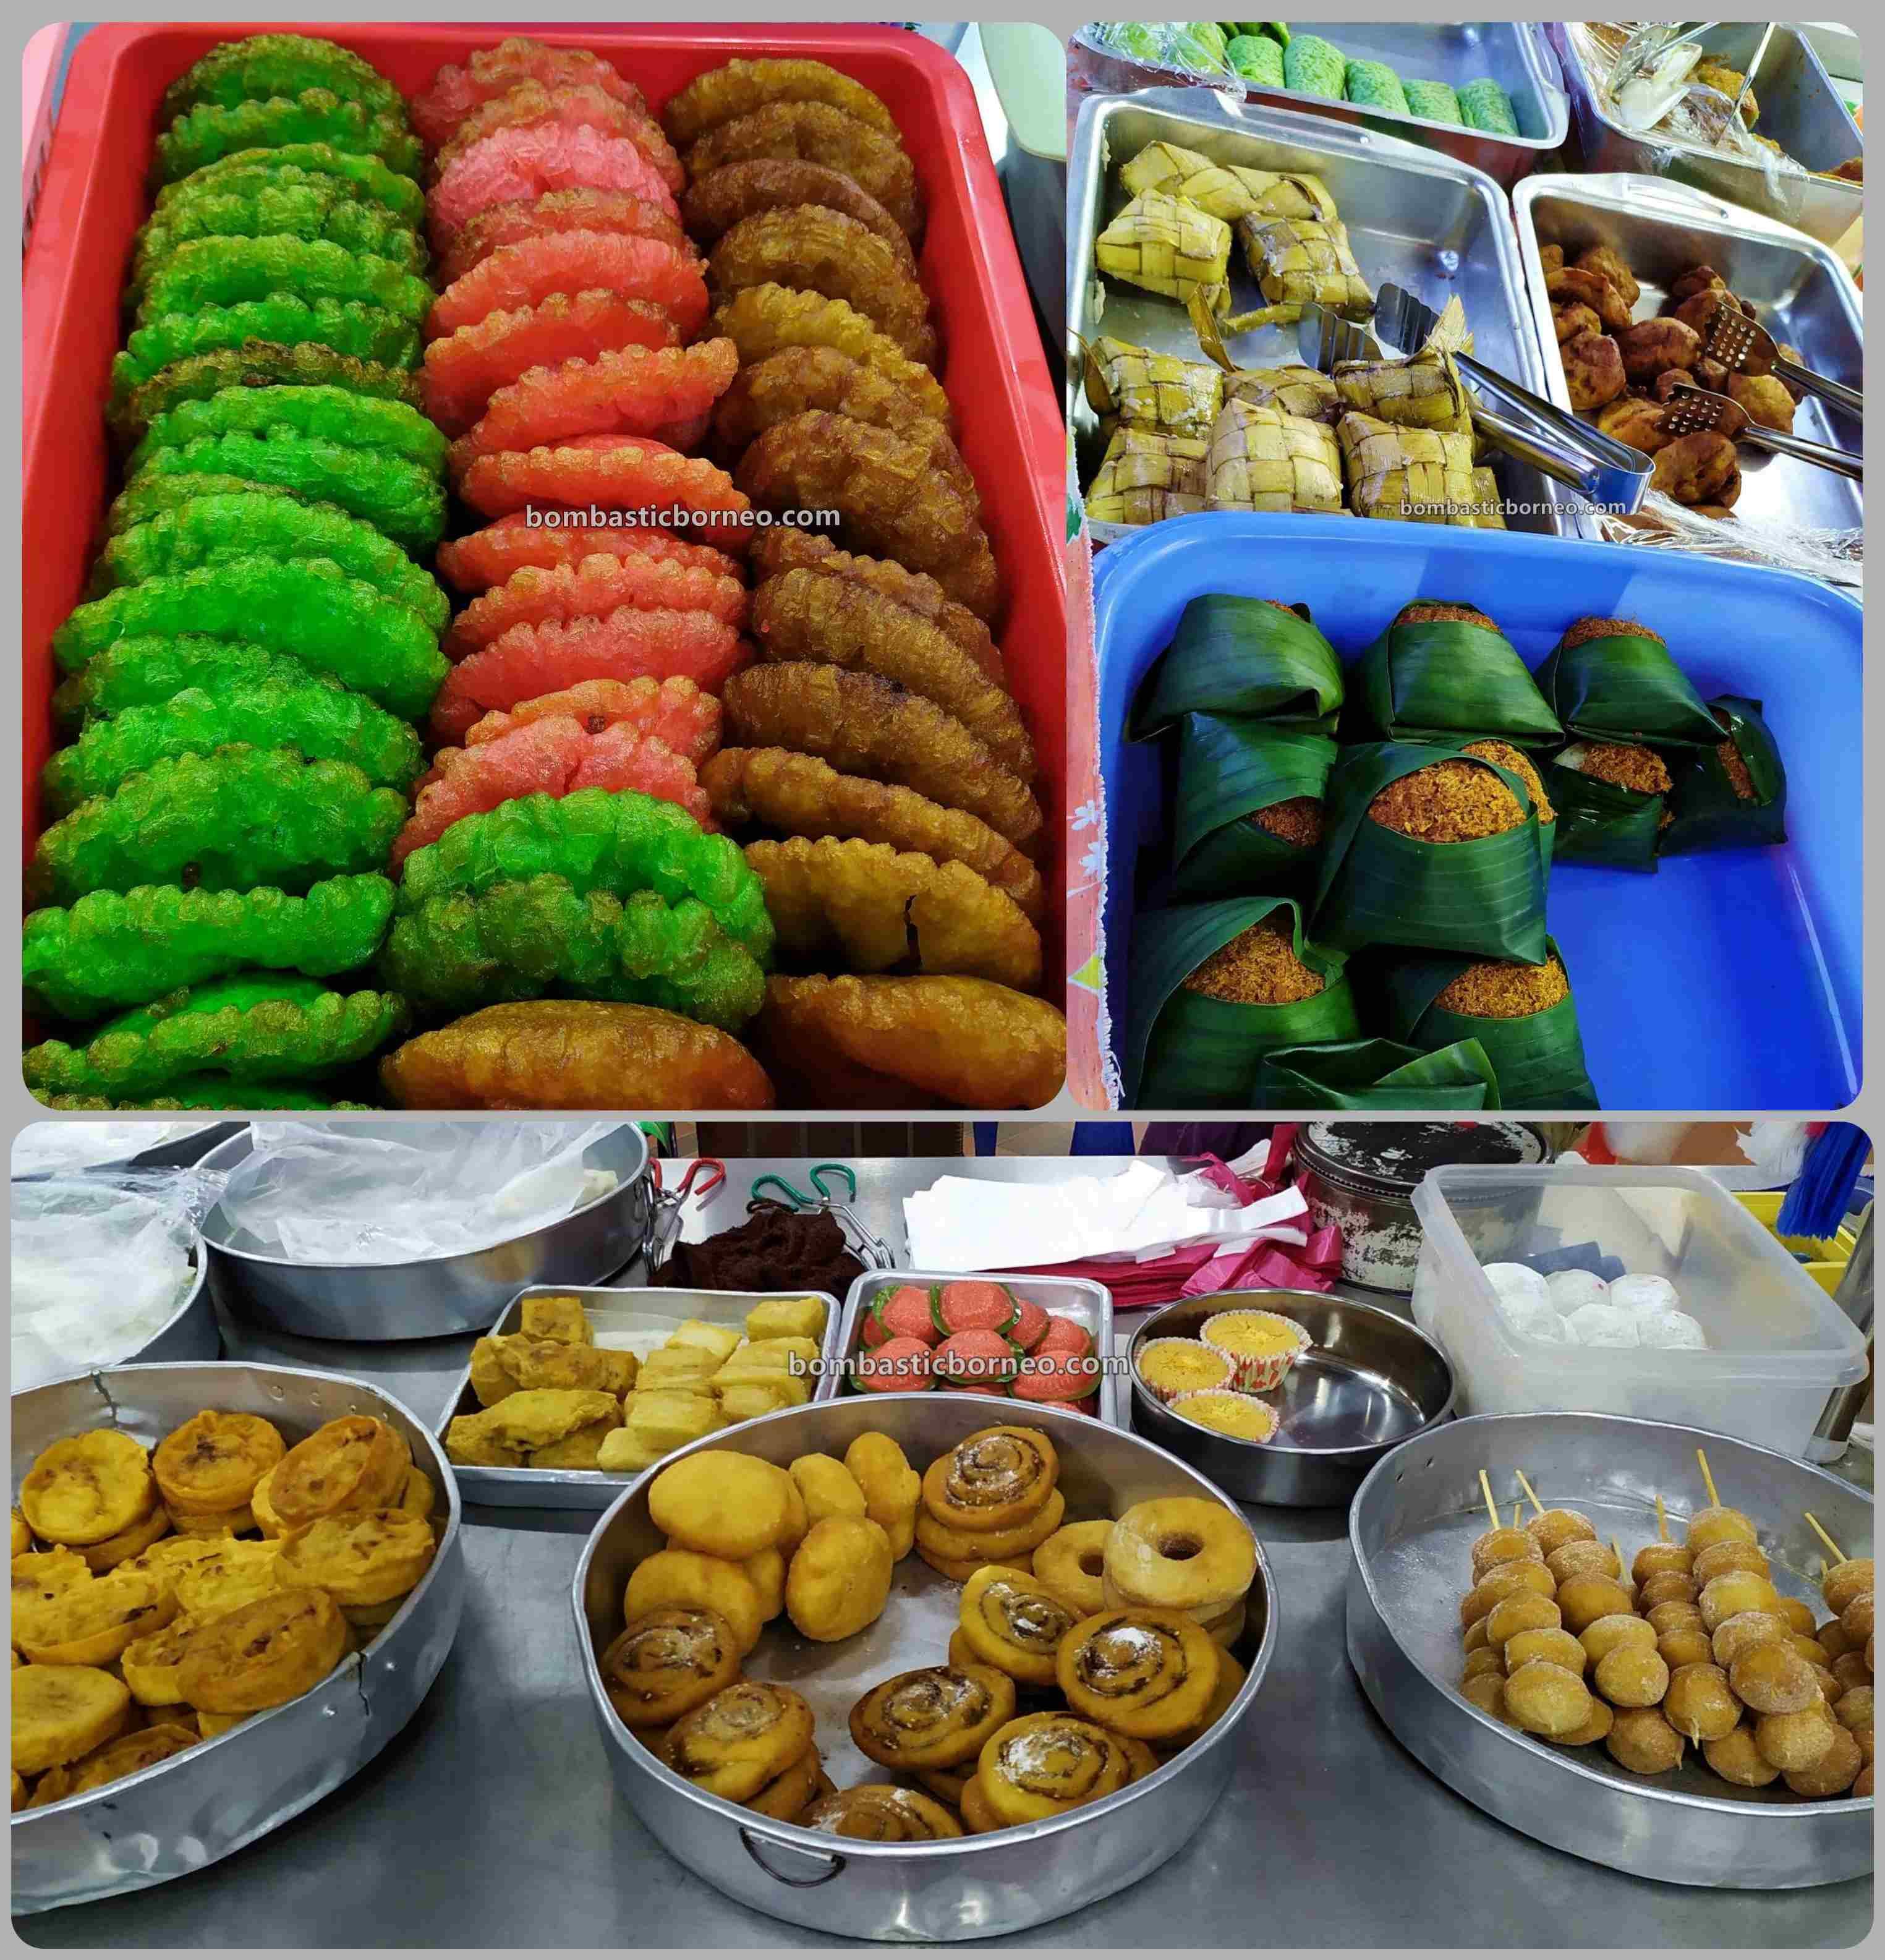 cakes, fruits, backpackers, Destination, exploration, traditional, local market, native market, town, Tourism, tourist attraction, Borneo, 马来西亚砂拉越, 美里马鲁帝早市,